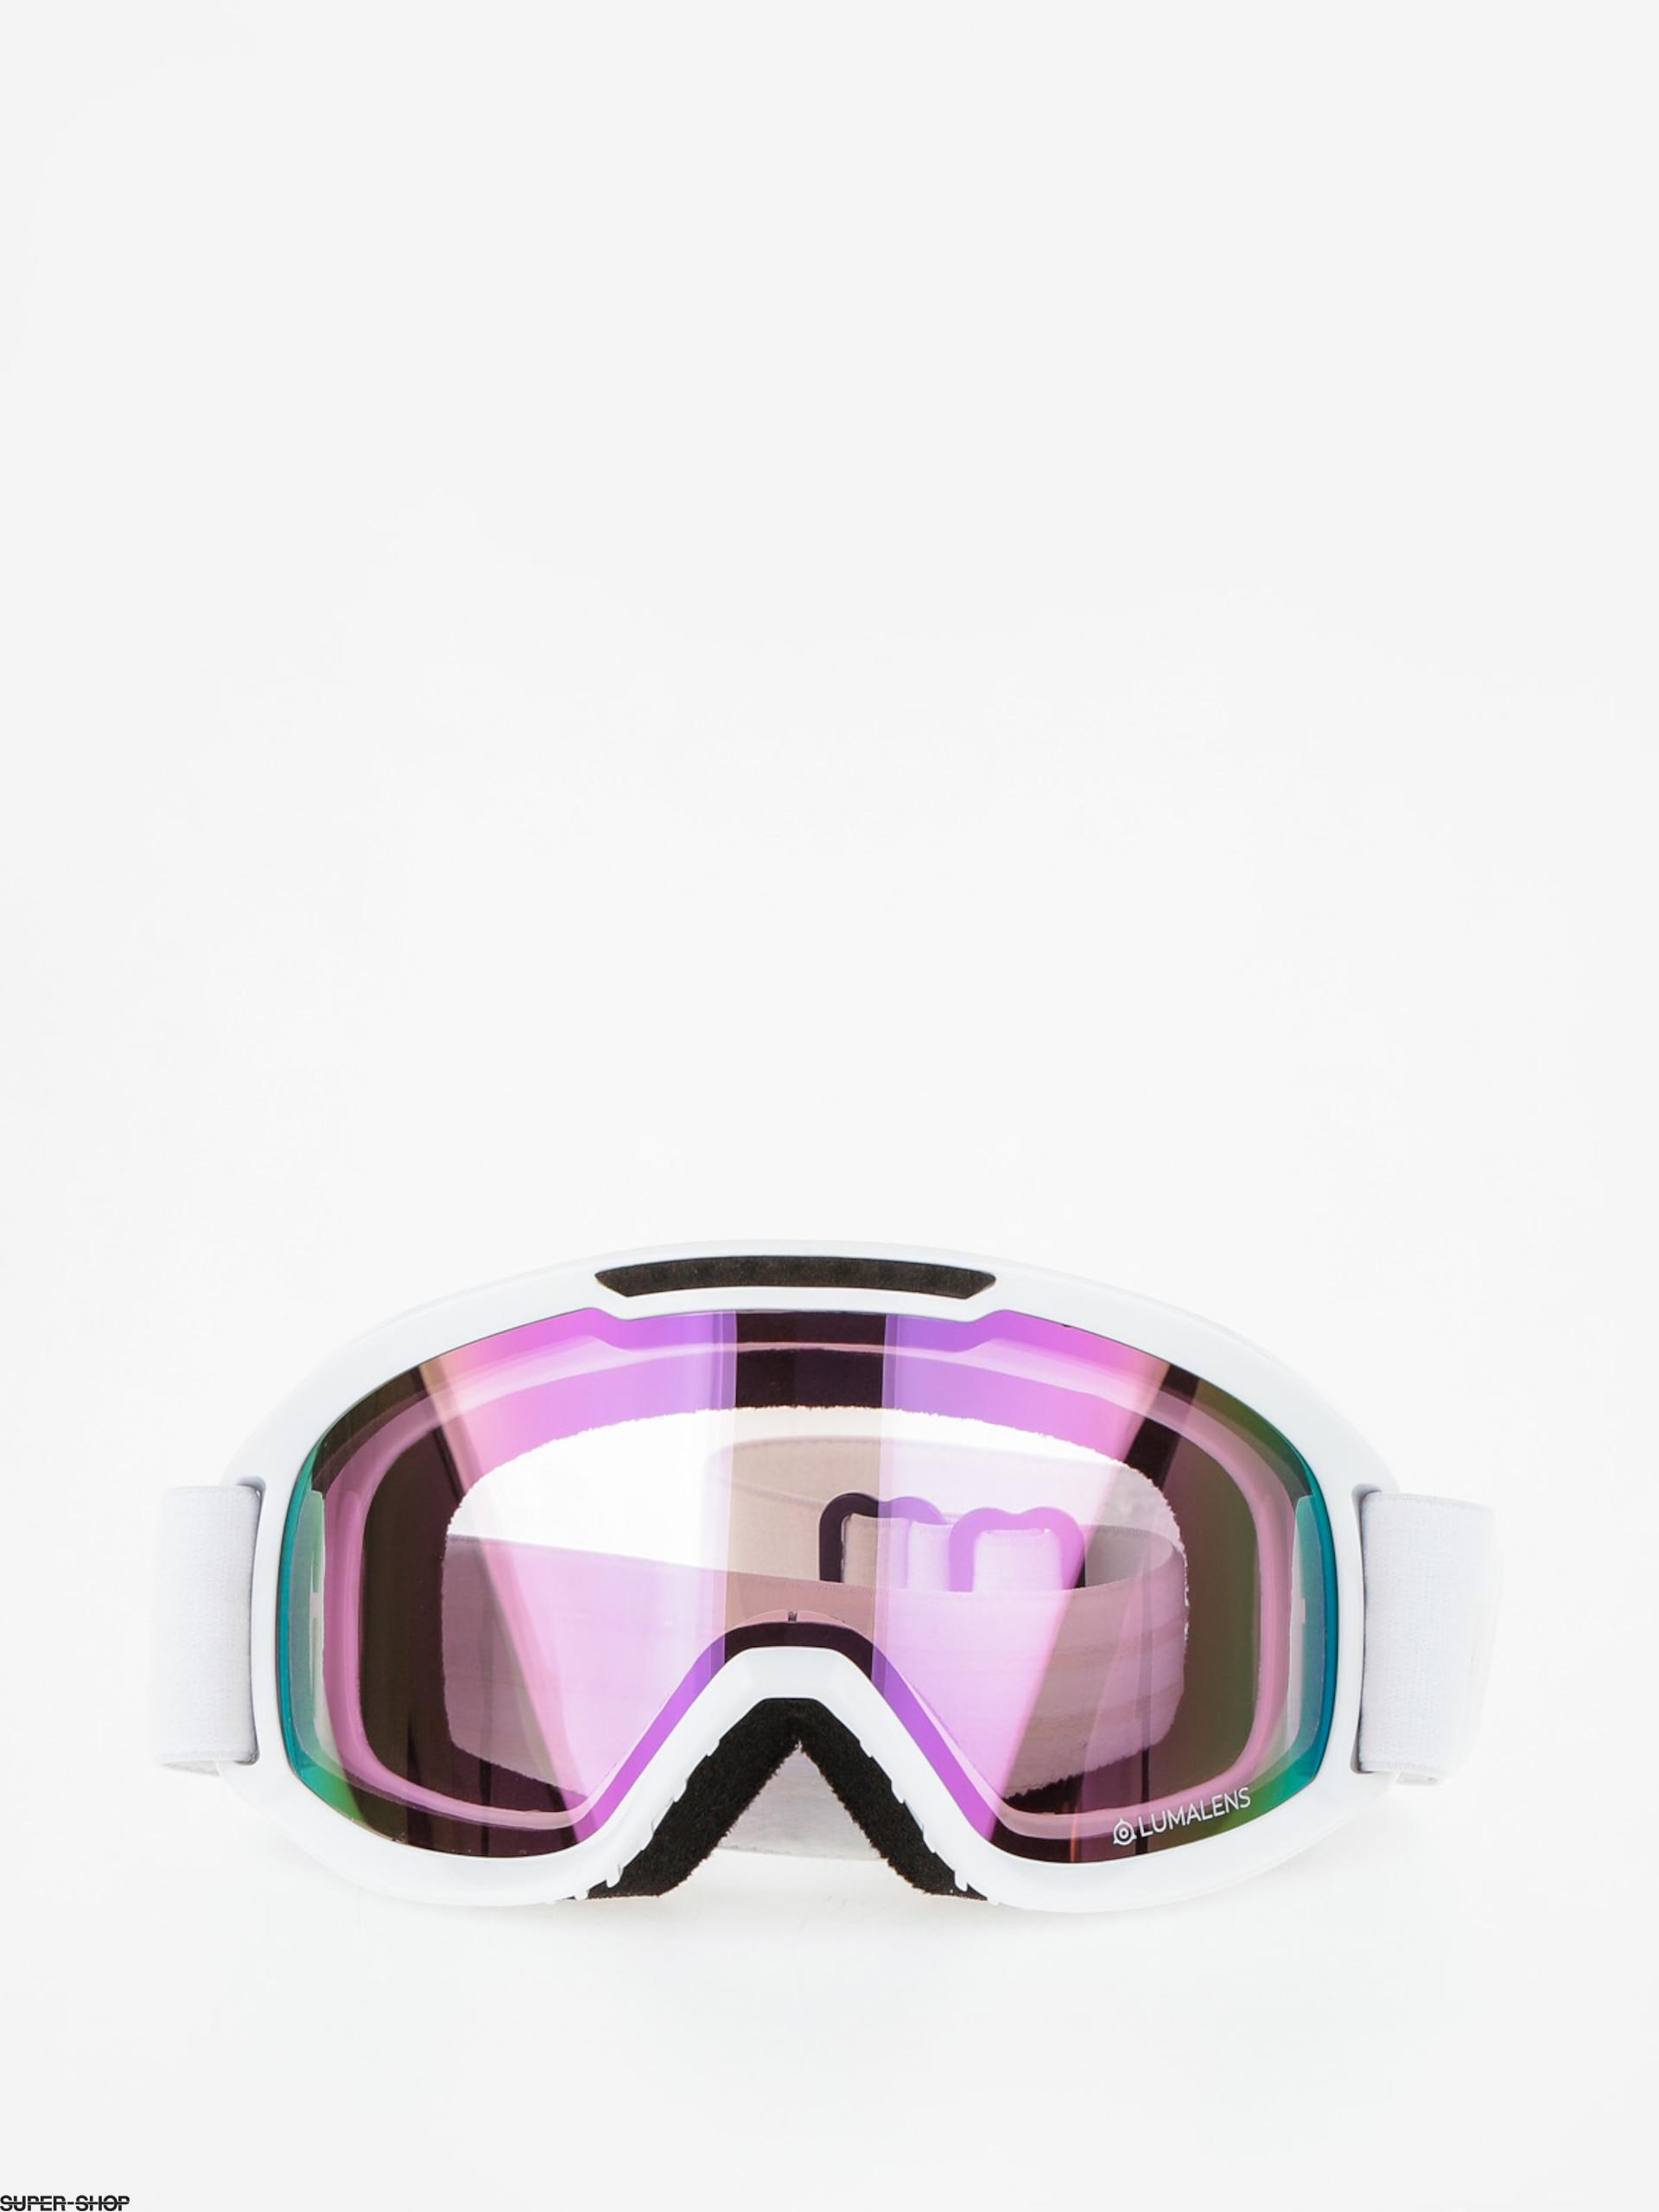 735f43f06006 Dragon Goggles DX2 (whiteout lumalens pink ion dark smoke)